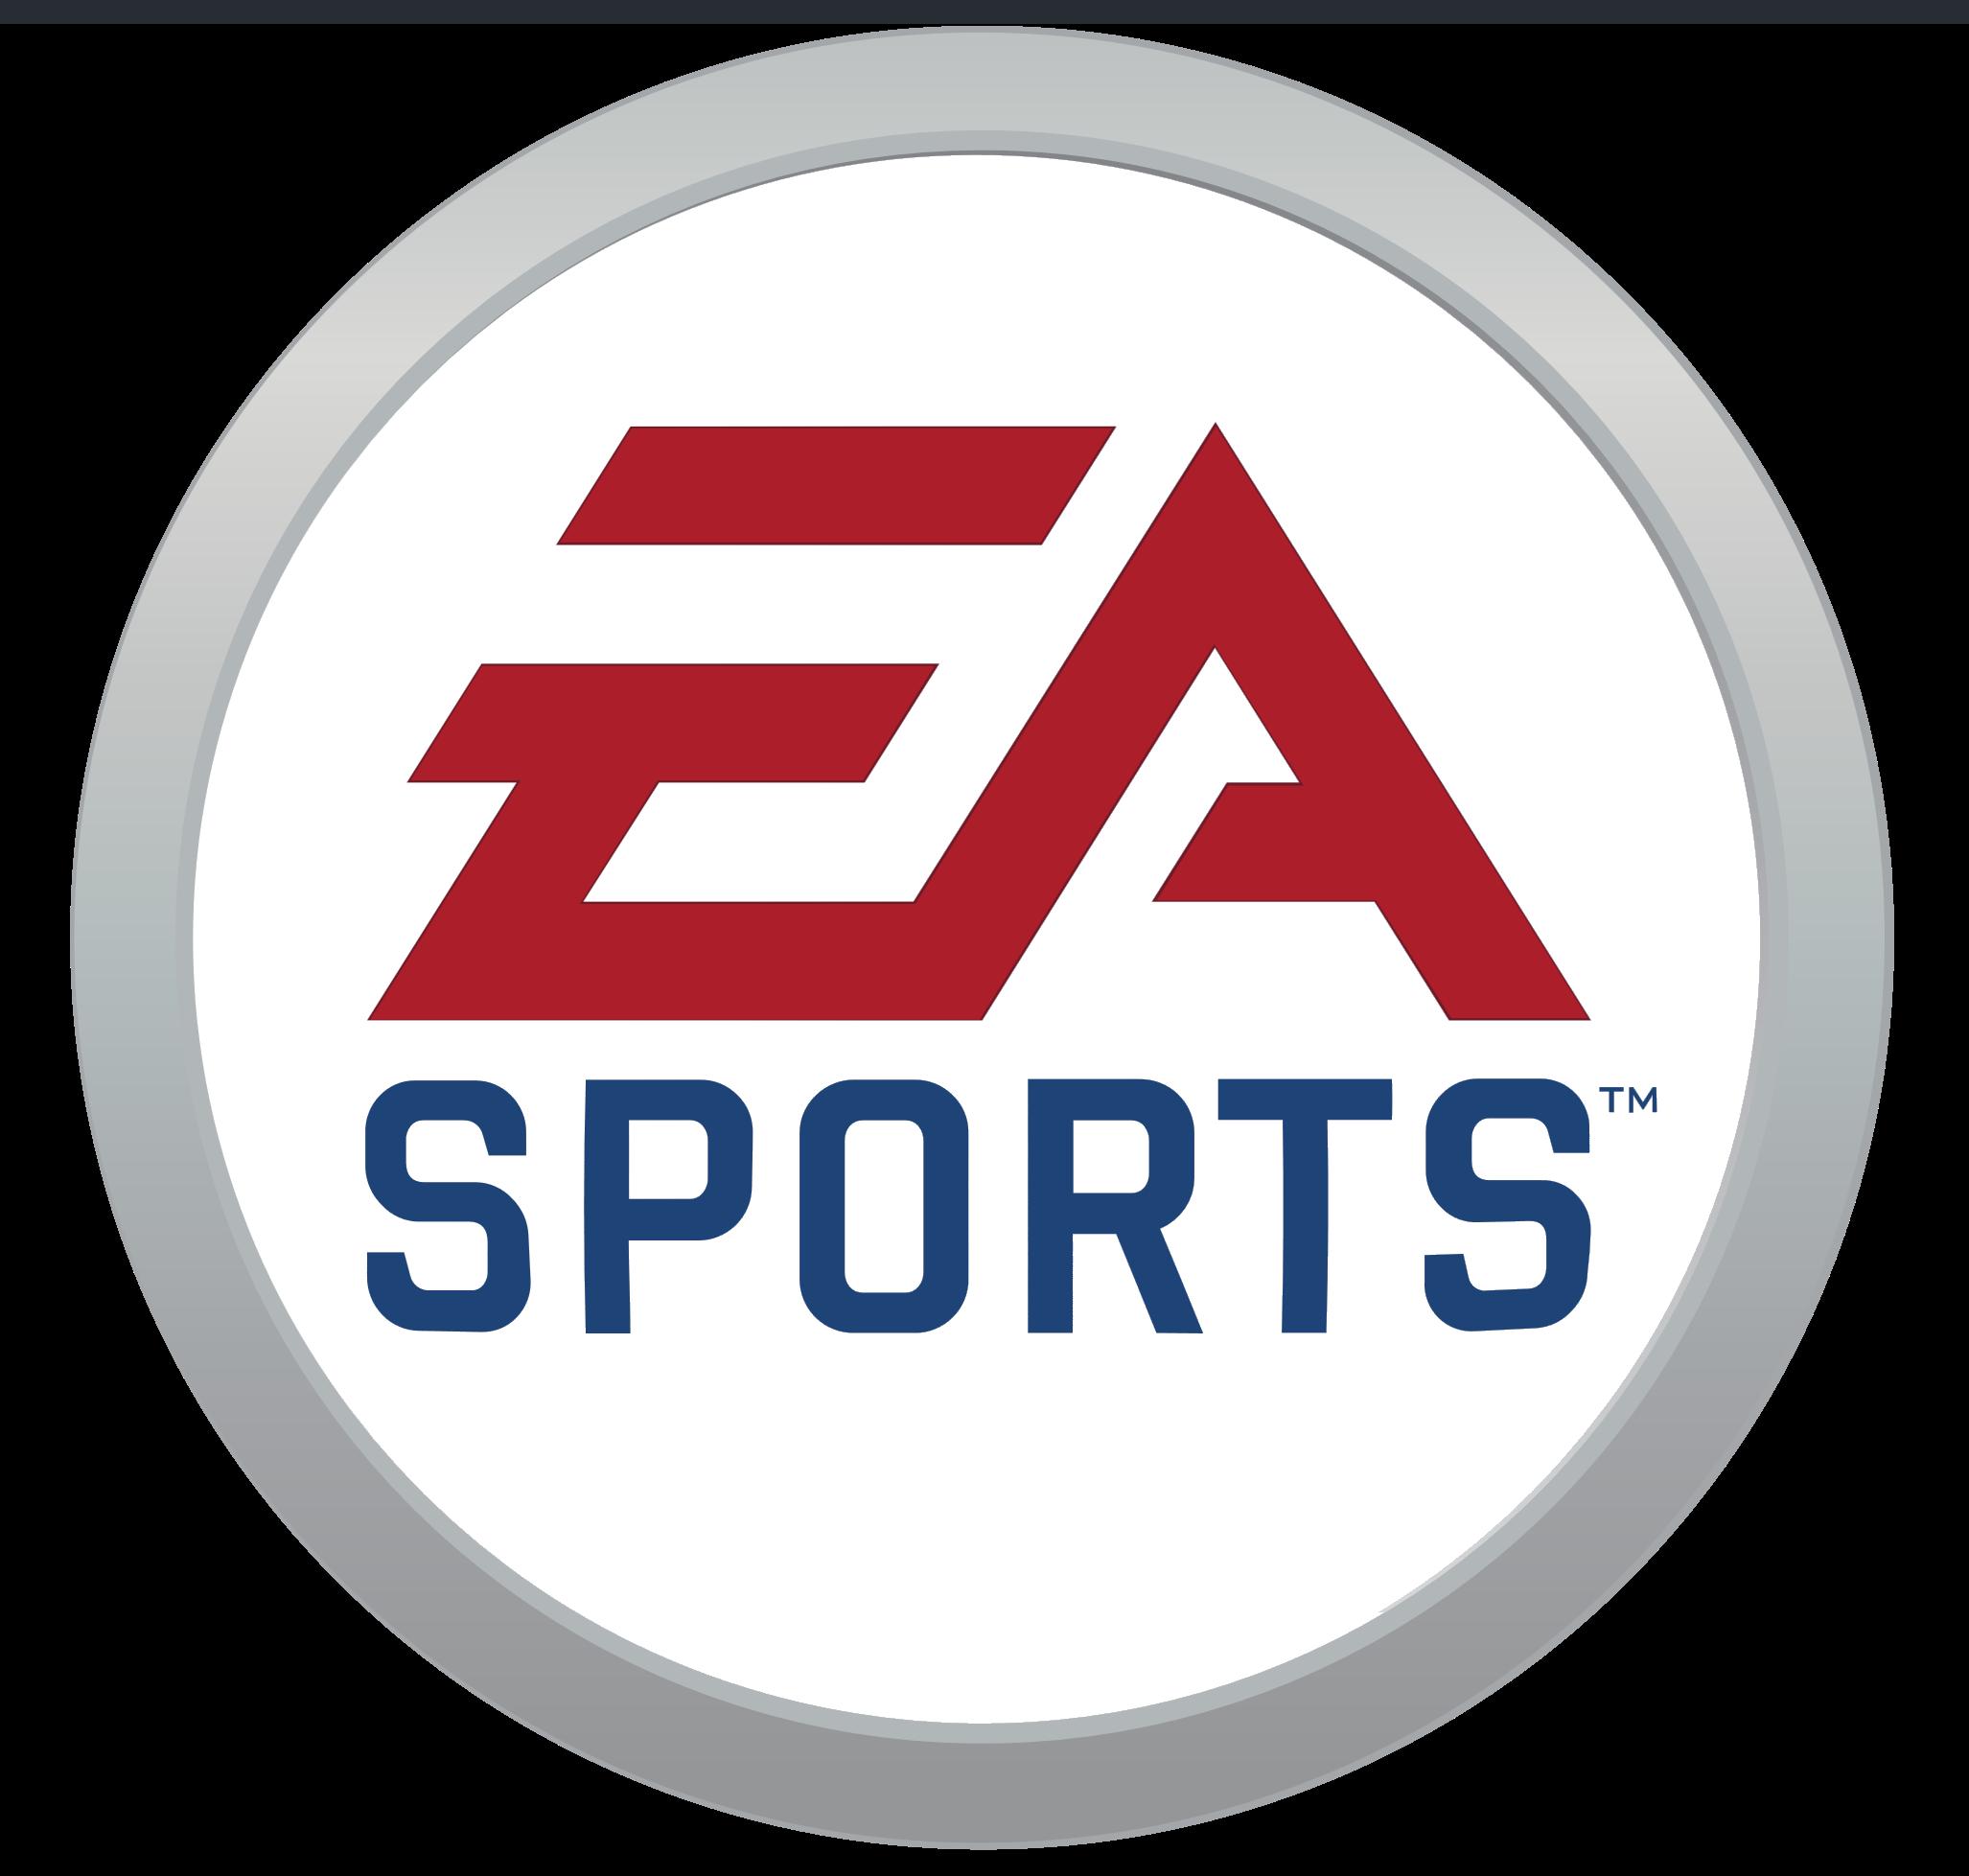 Ea sports logos download ea sports logo symbol logotype biocorpaavc